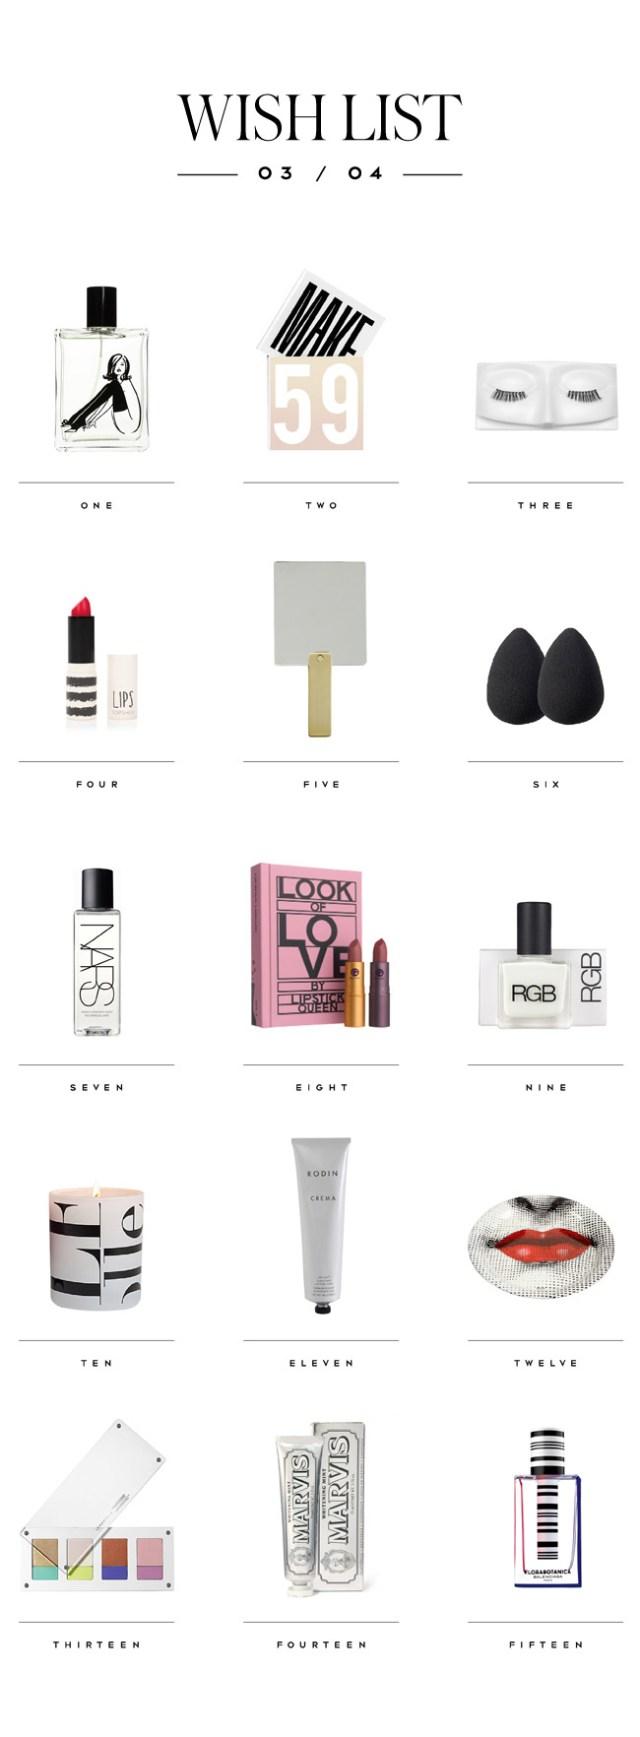 Nubby Twiglet   Designer Wish List #3: Thoughtful Beauty